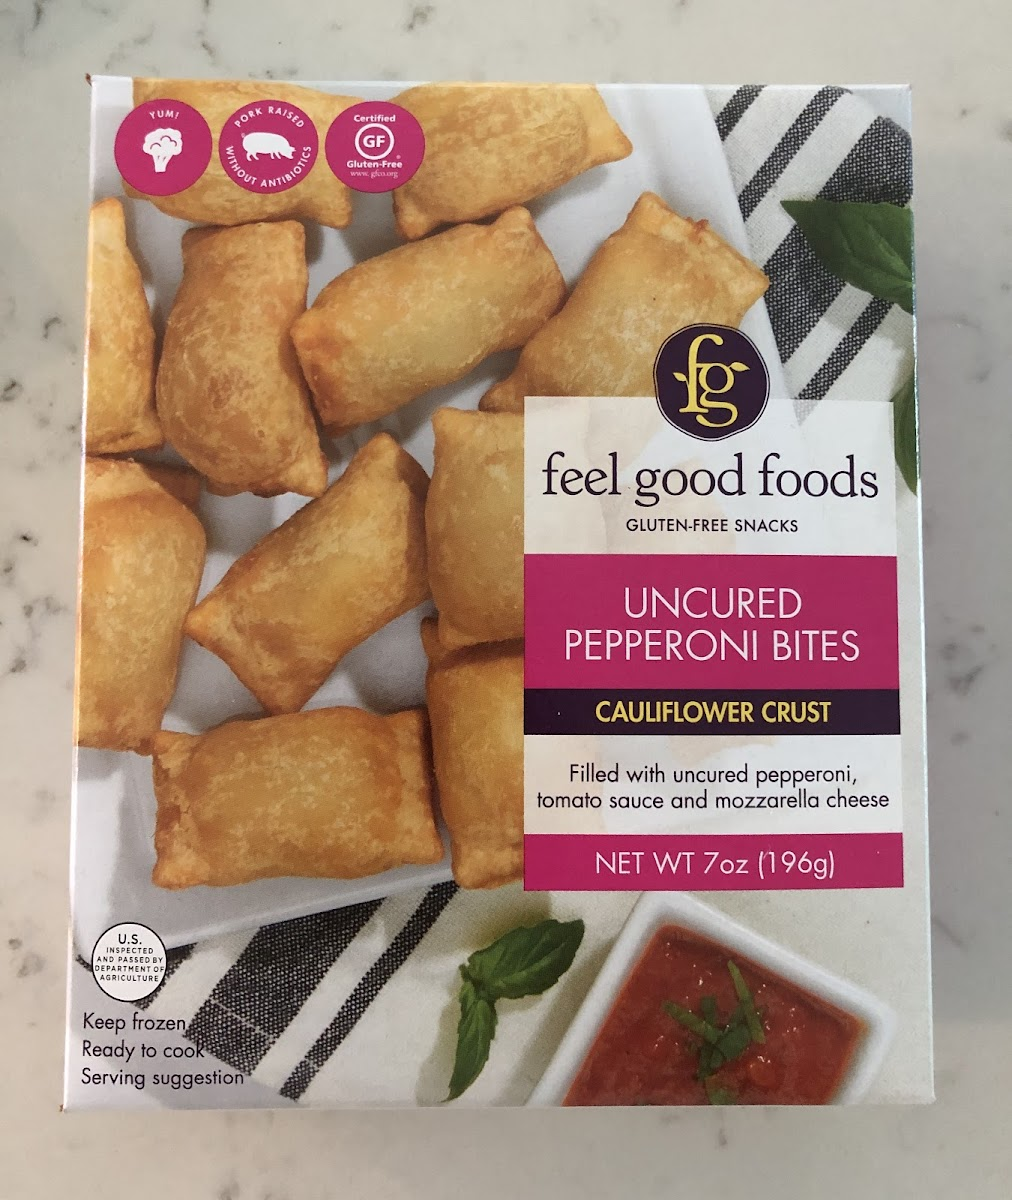 Uncured Pepperoni Bites, Cauliflower Crust